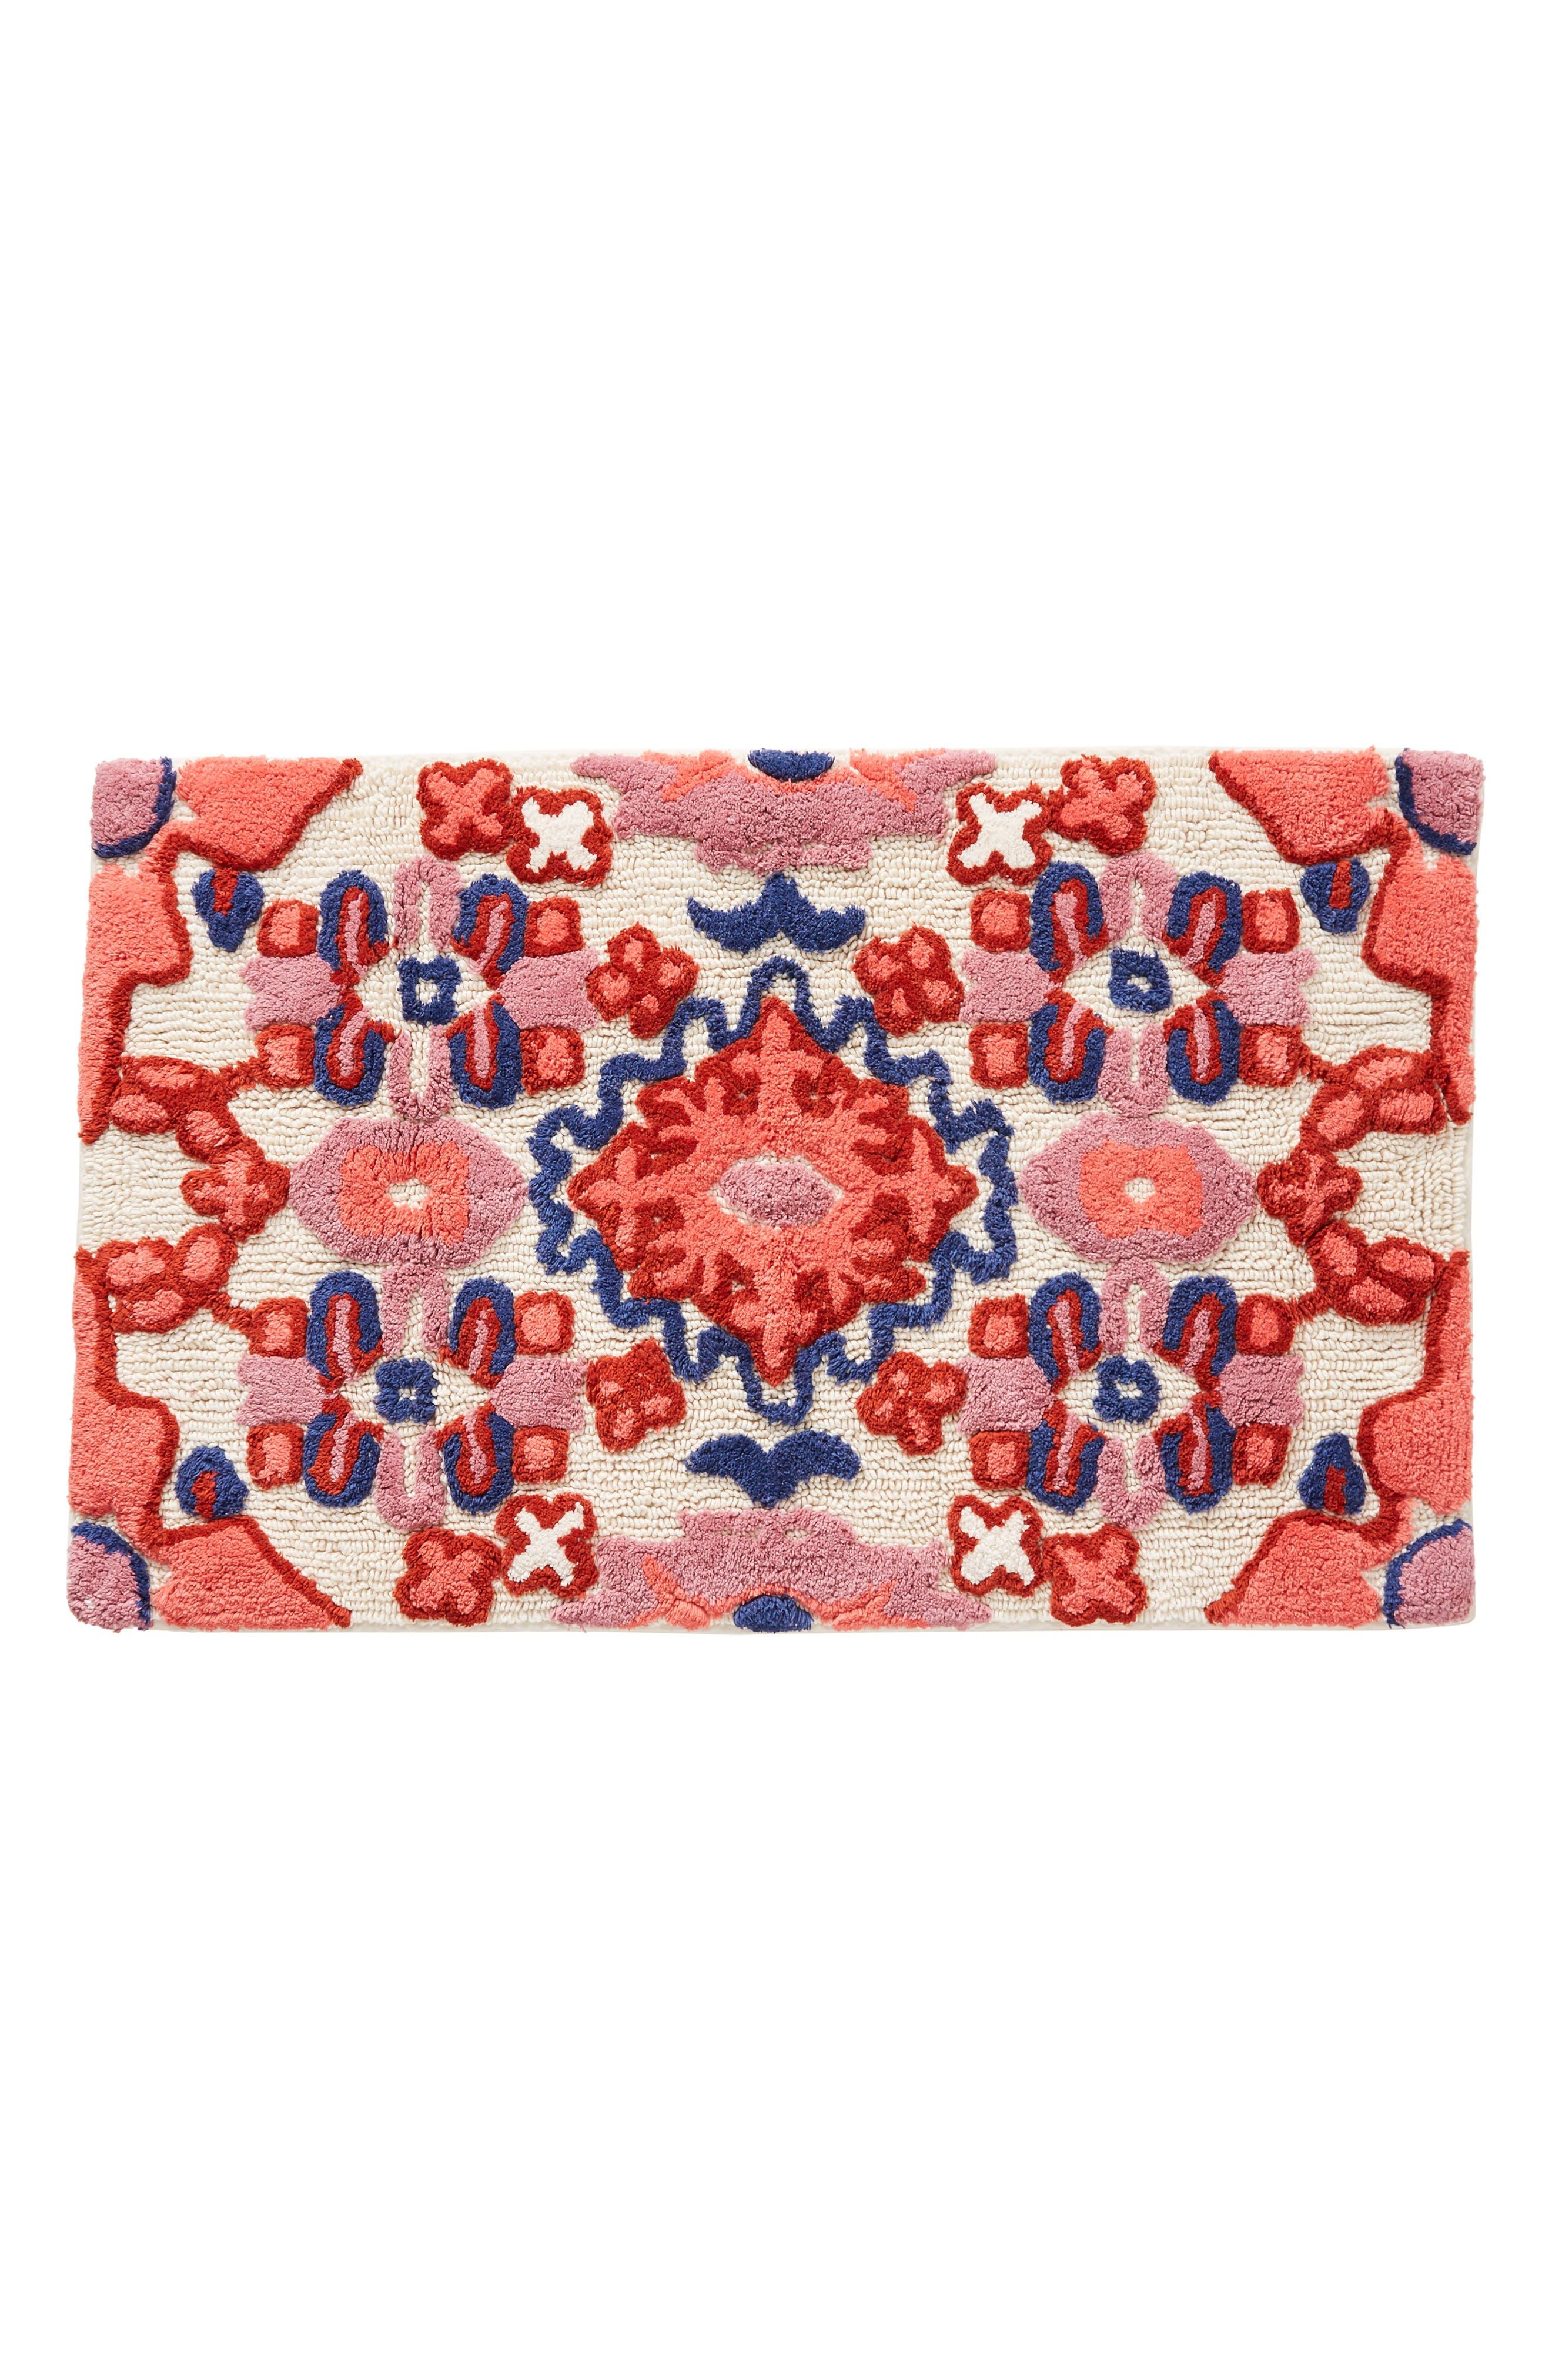 ANTHROPOLOGIE, Astor Bath Mat, Alternate thumbnail 2, color, RED COMBO